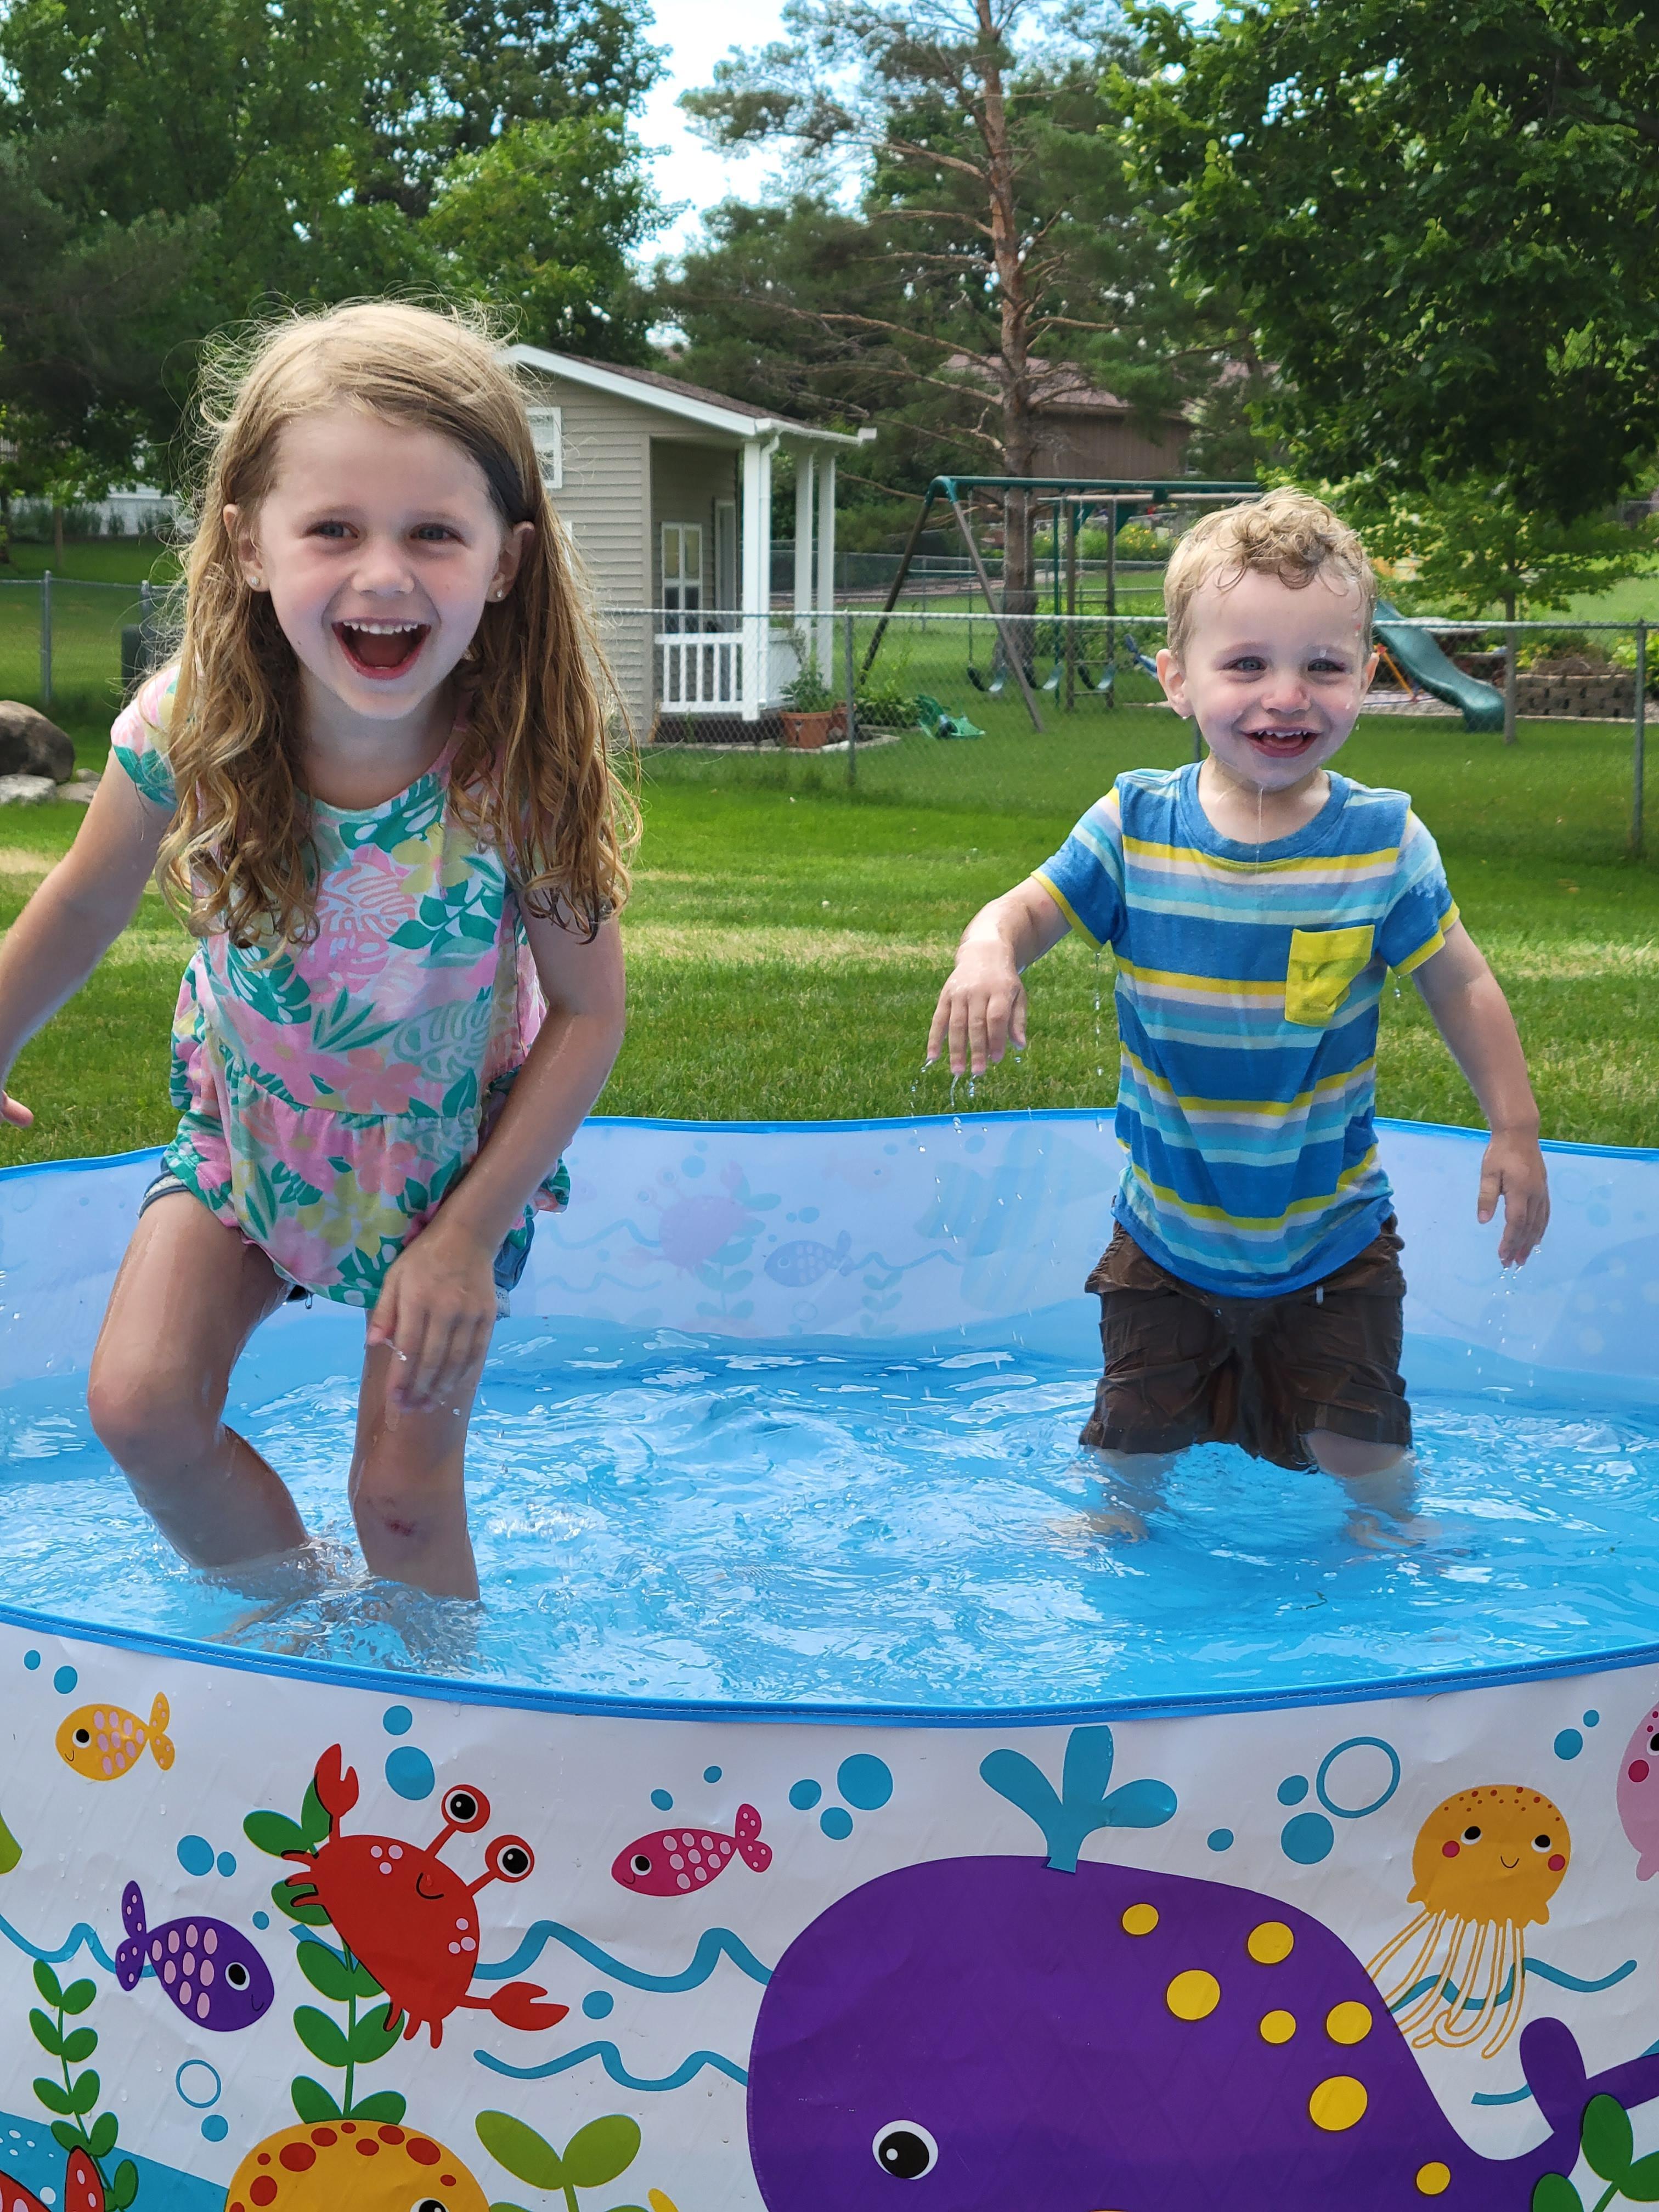 small children playing in backyard pool